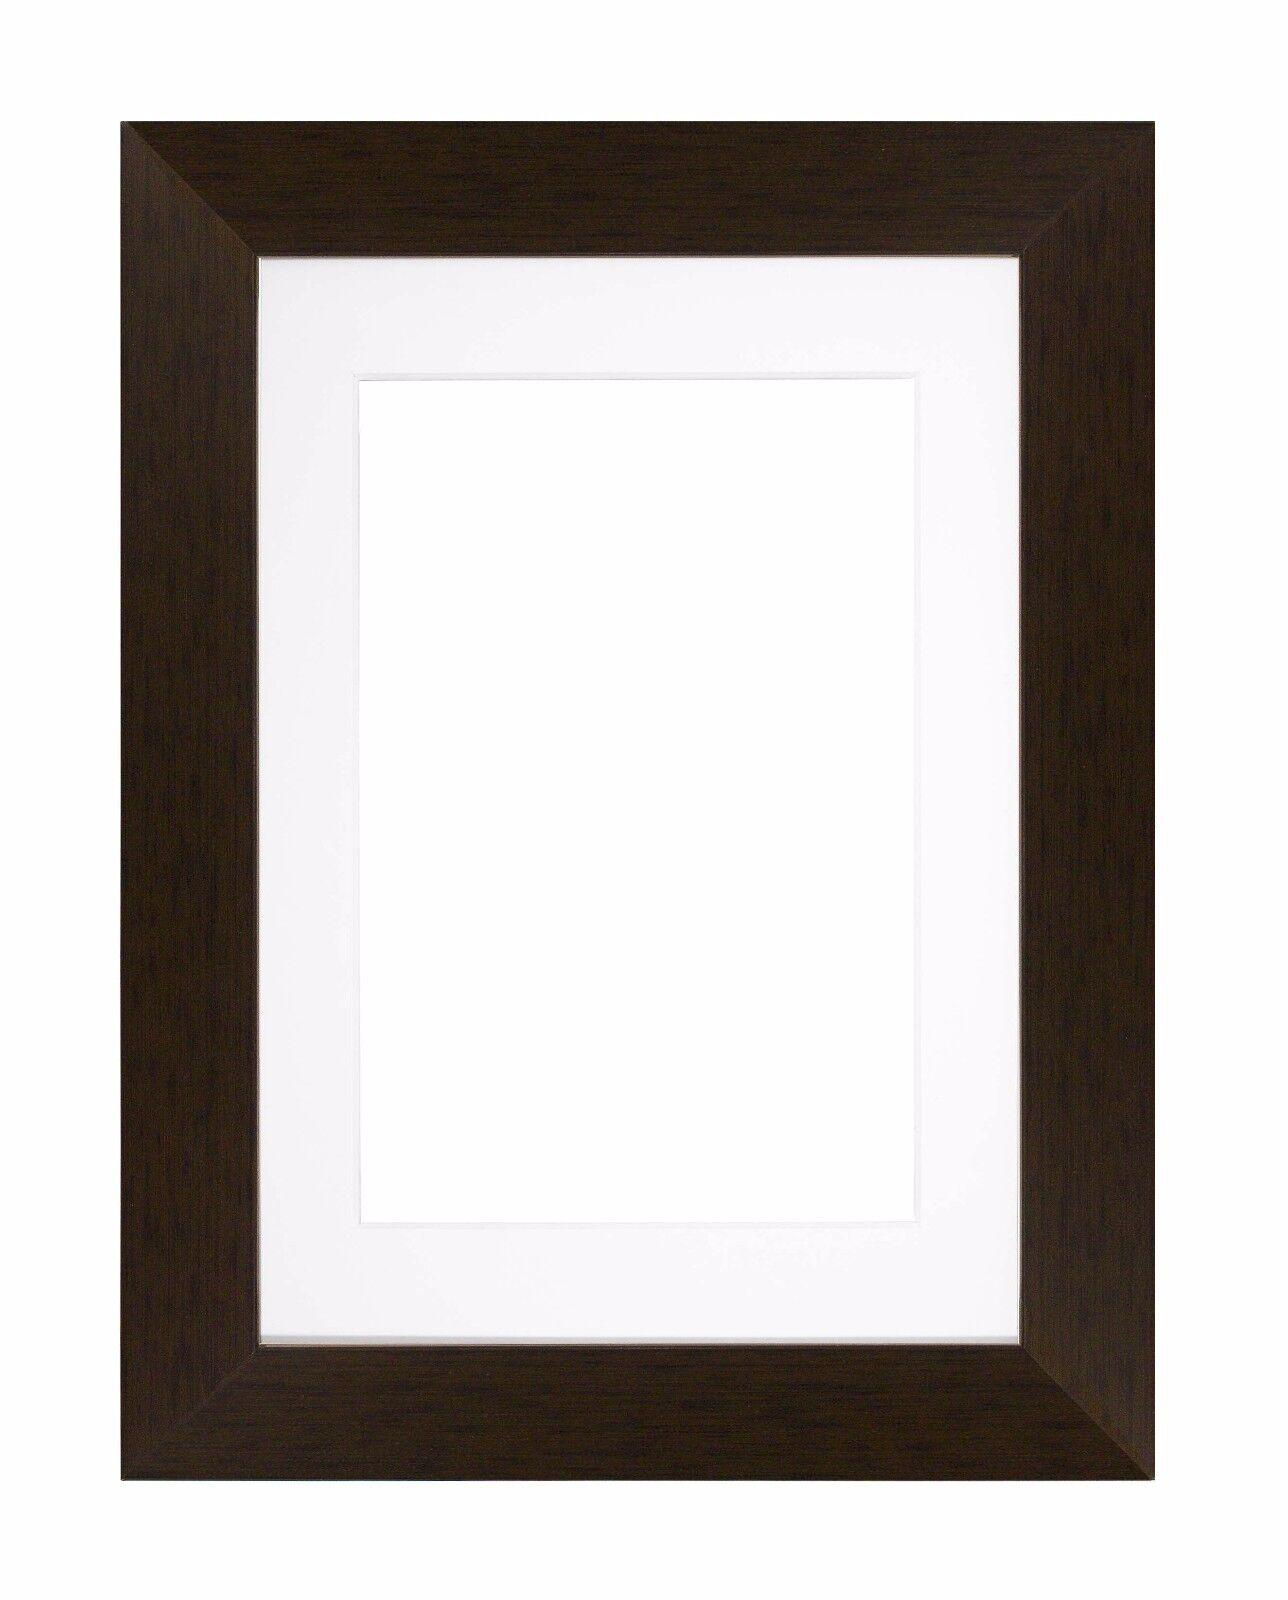 Basic Wood Frame Range Picture Photo Poster Frames With Bespoke ...